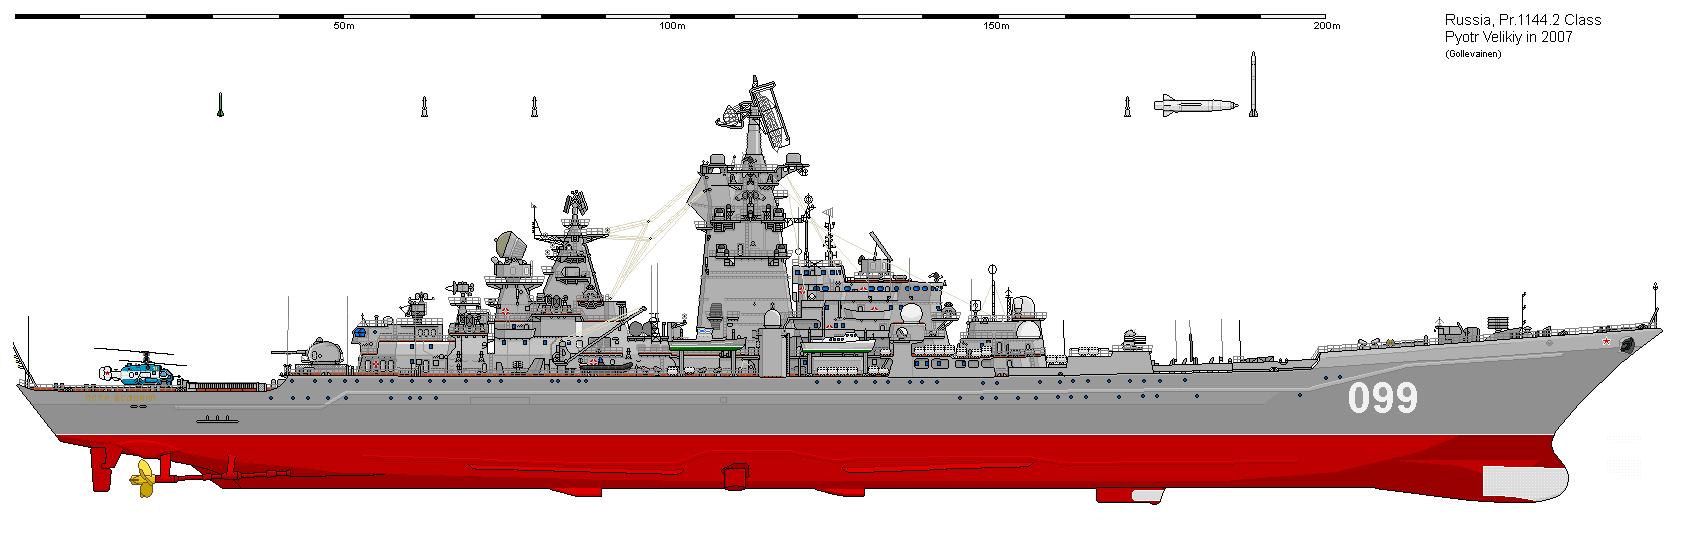 TARKR 11442 Pyotr Velikyi 2007.png